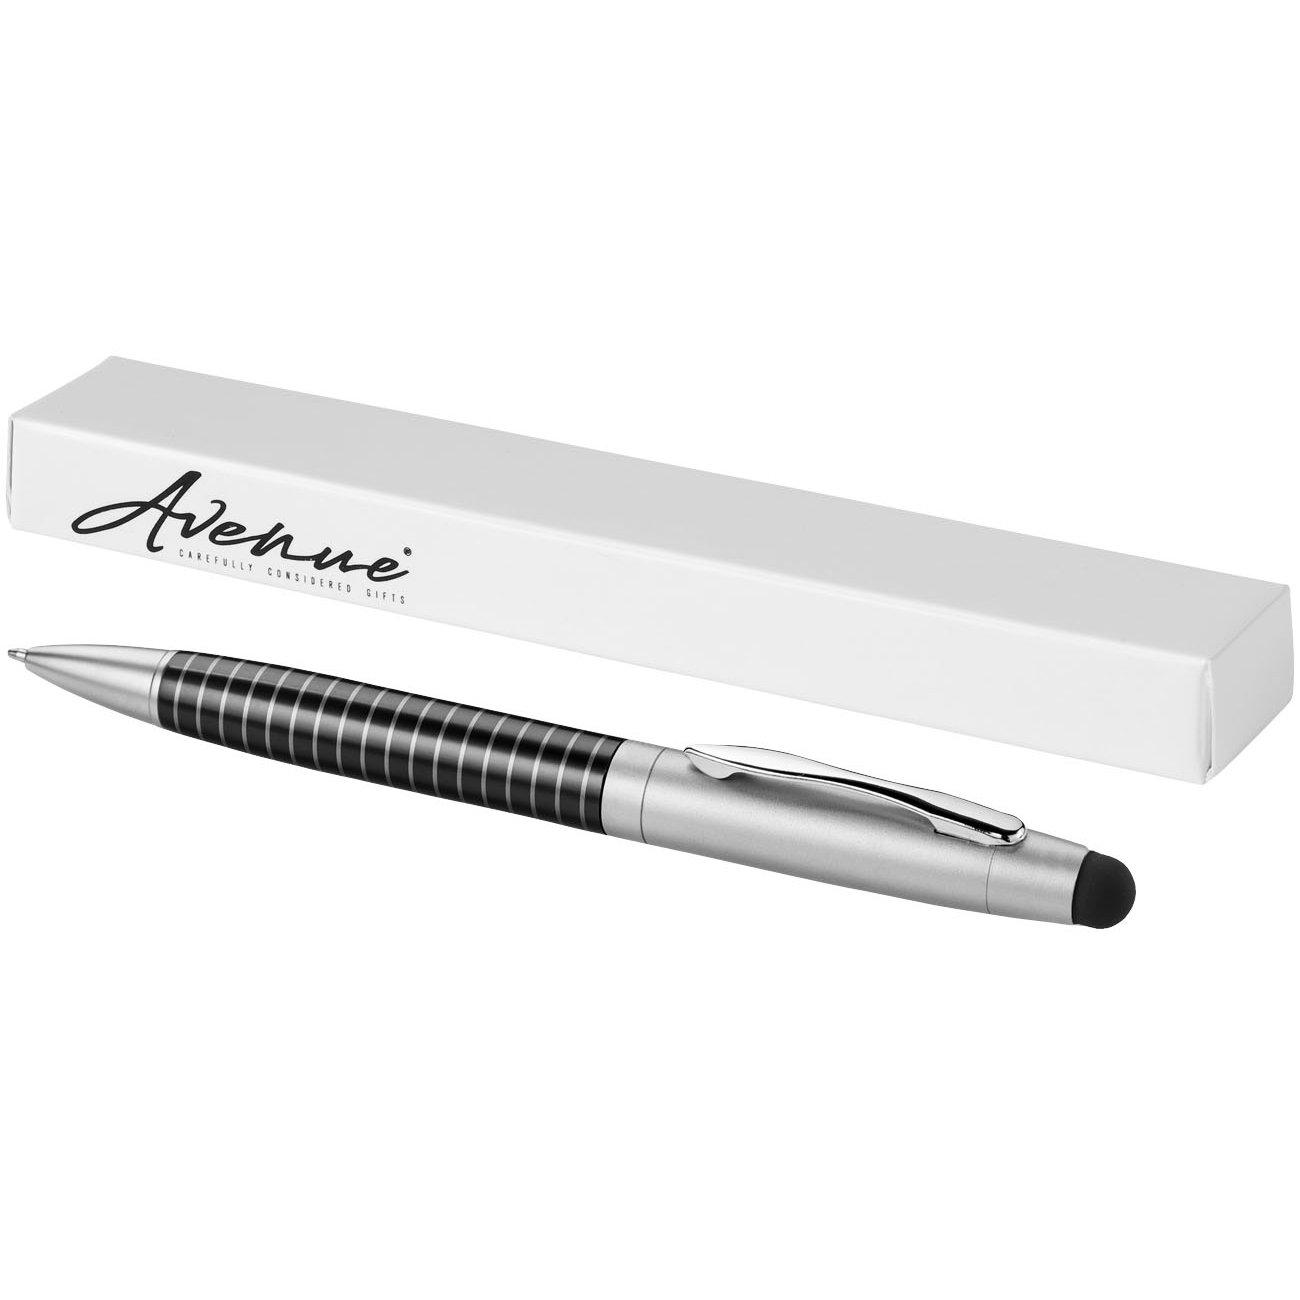 Avenue Averell stylus ballpoint pen, blue ink